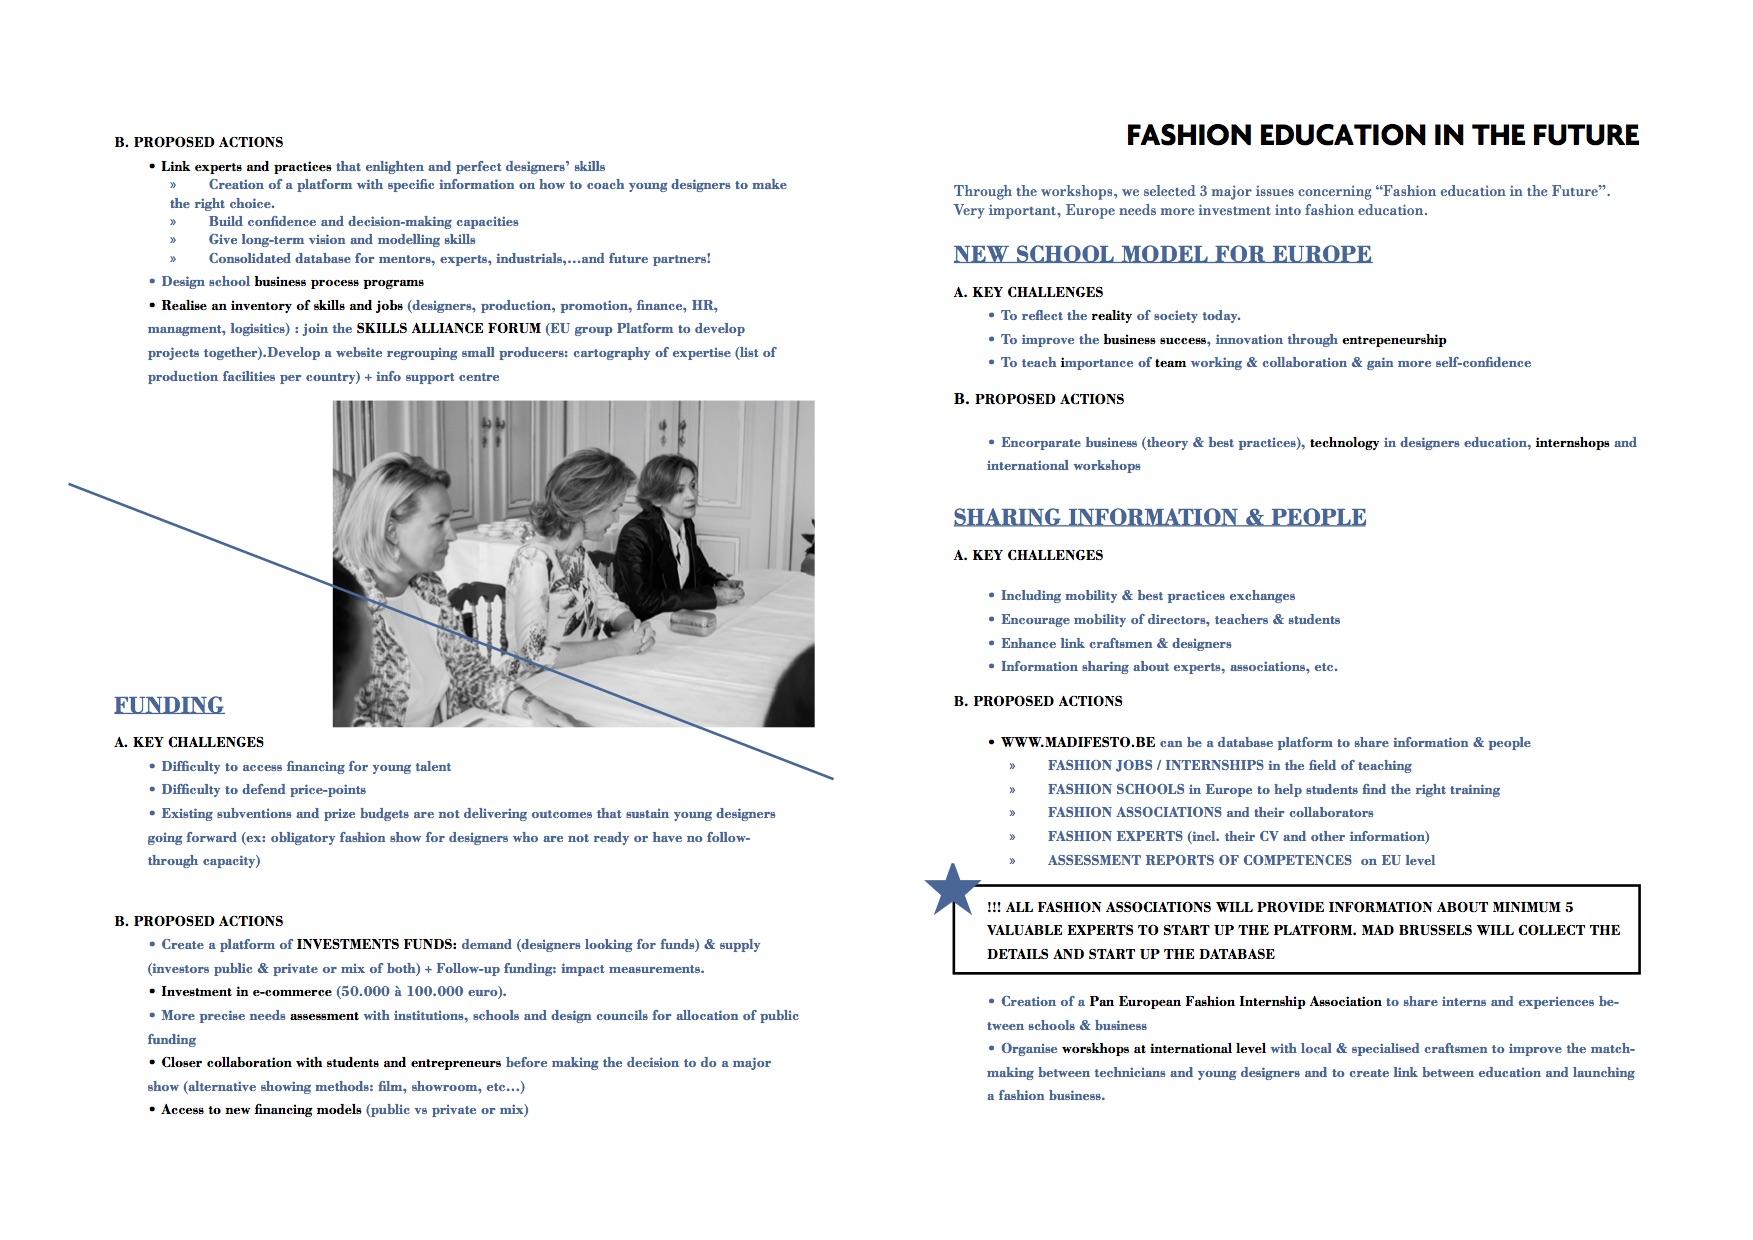 MADIFESTO CONCLUSIONS 2014-3.jpg